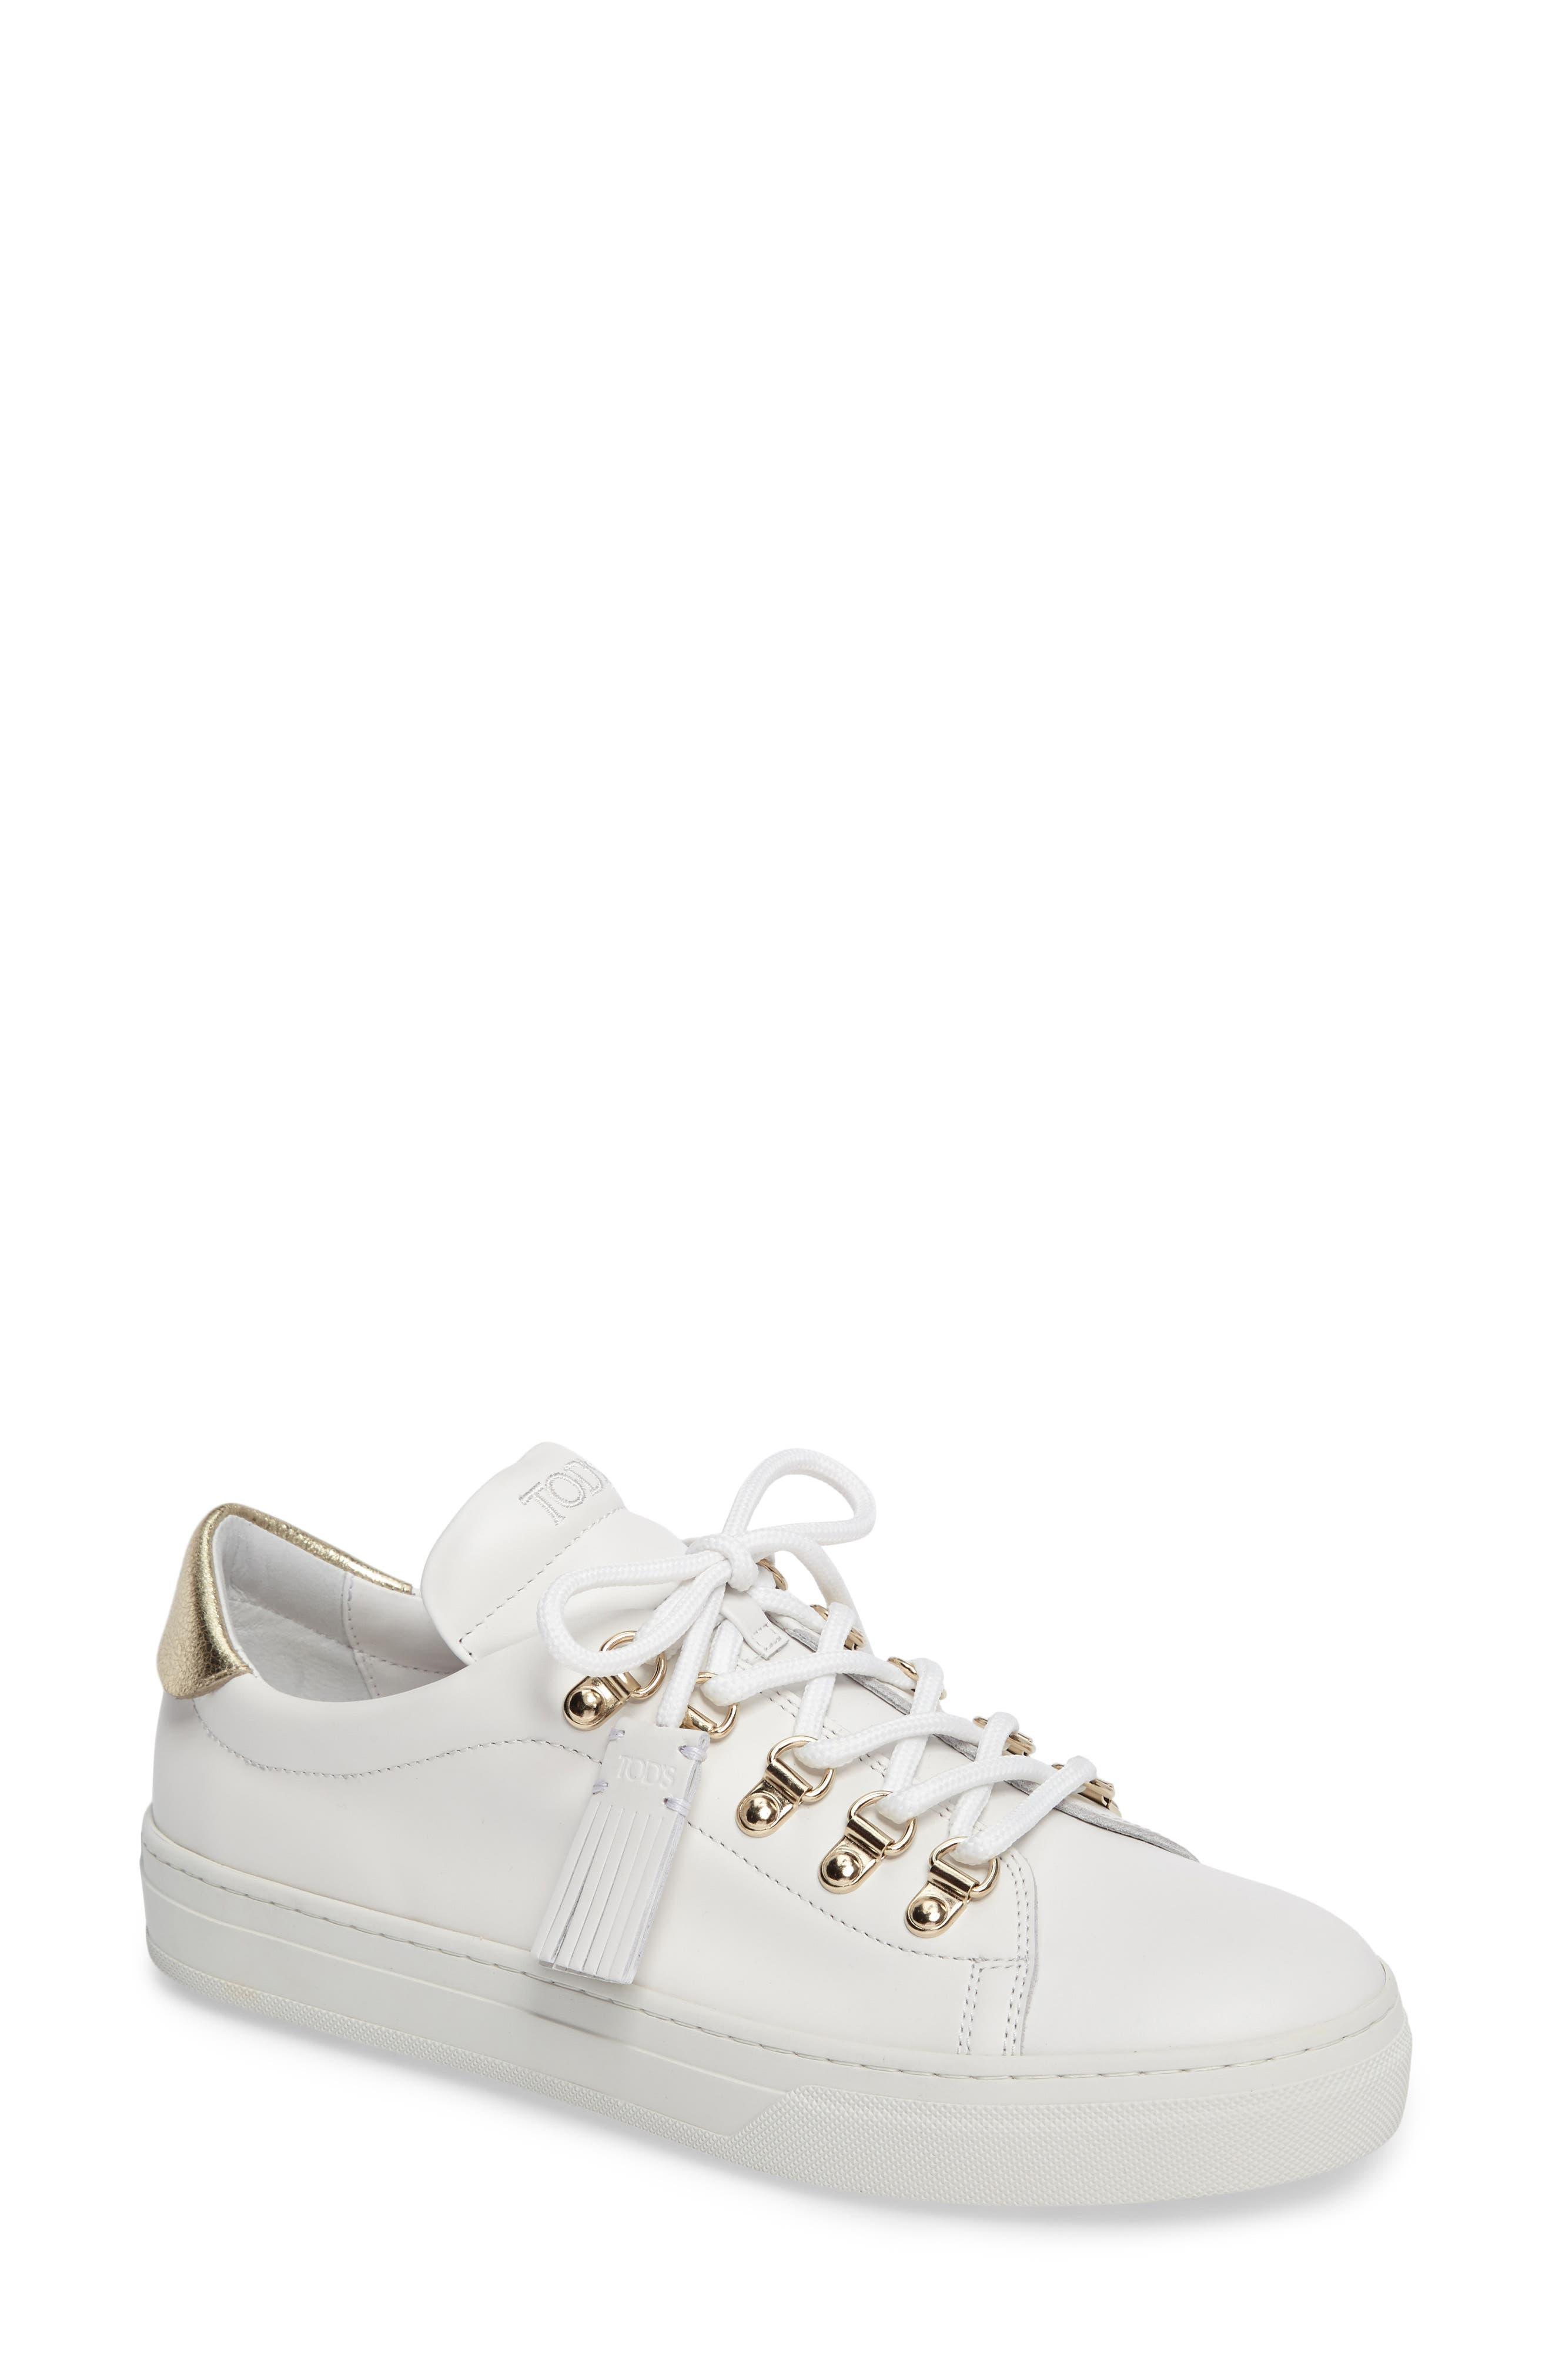 Hiker Low Top Sneaker,                         Main,                         color, 100